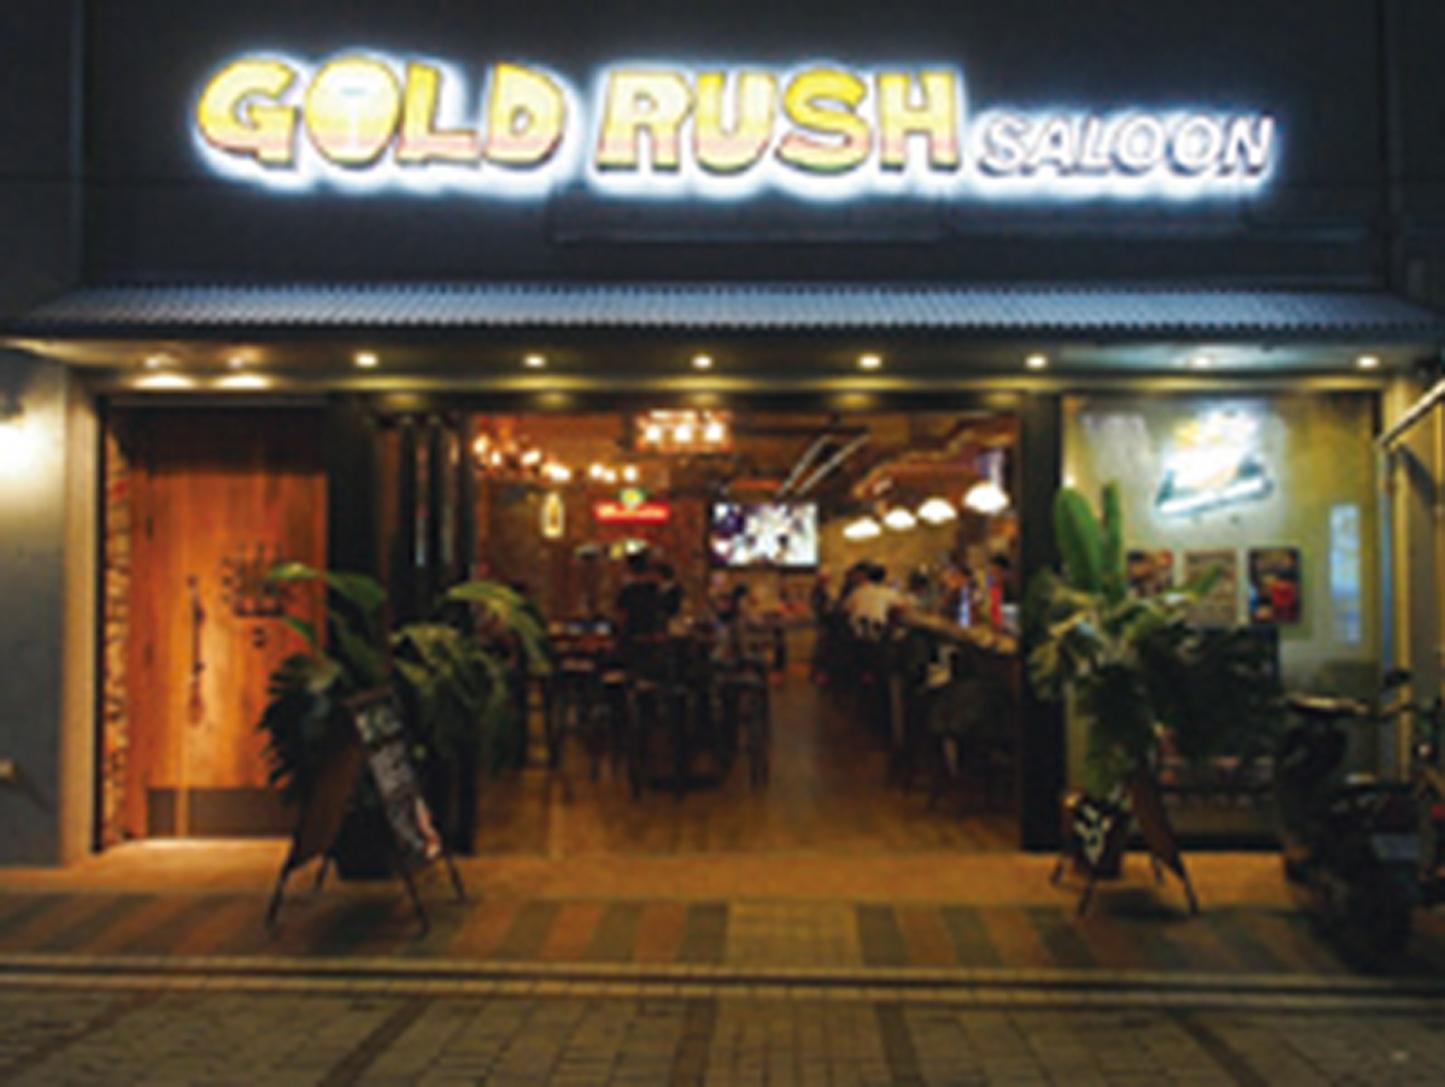 goldrushsaloon 店舗写真